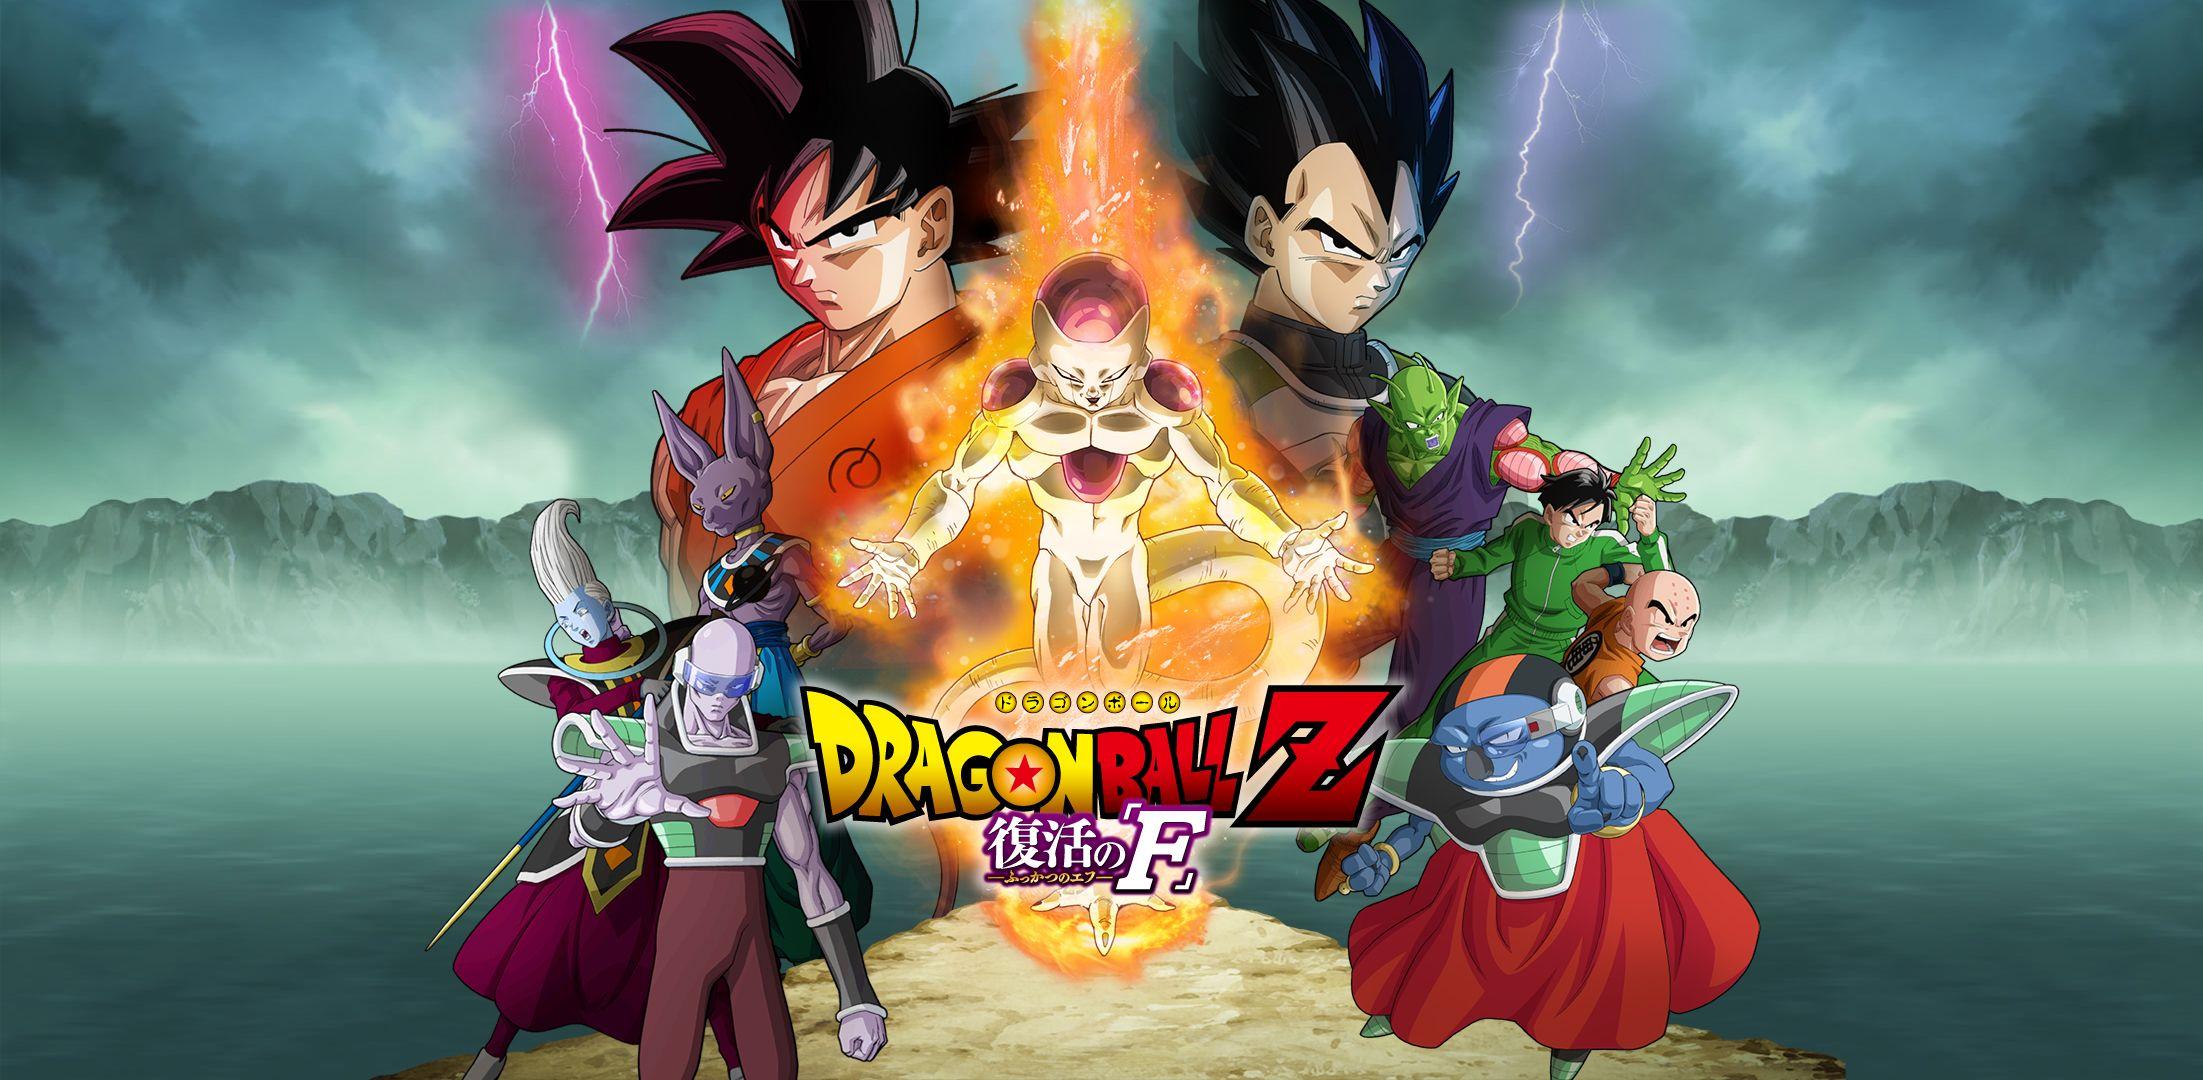 Pin De Anime News Em Dragon Ball Anime Wallpaper Do Goku